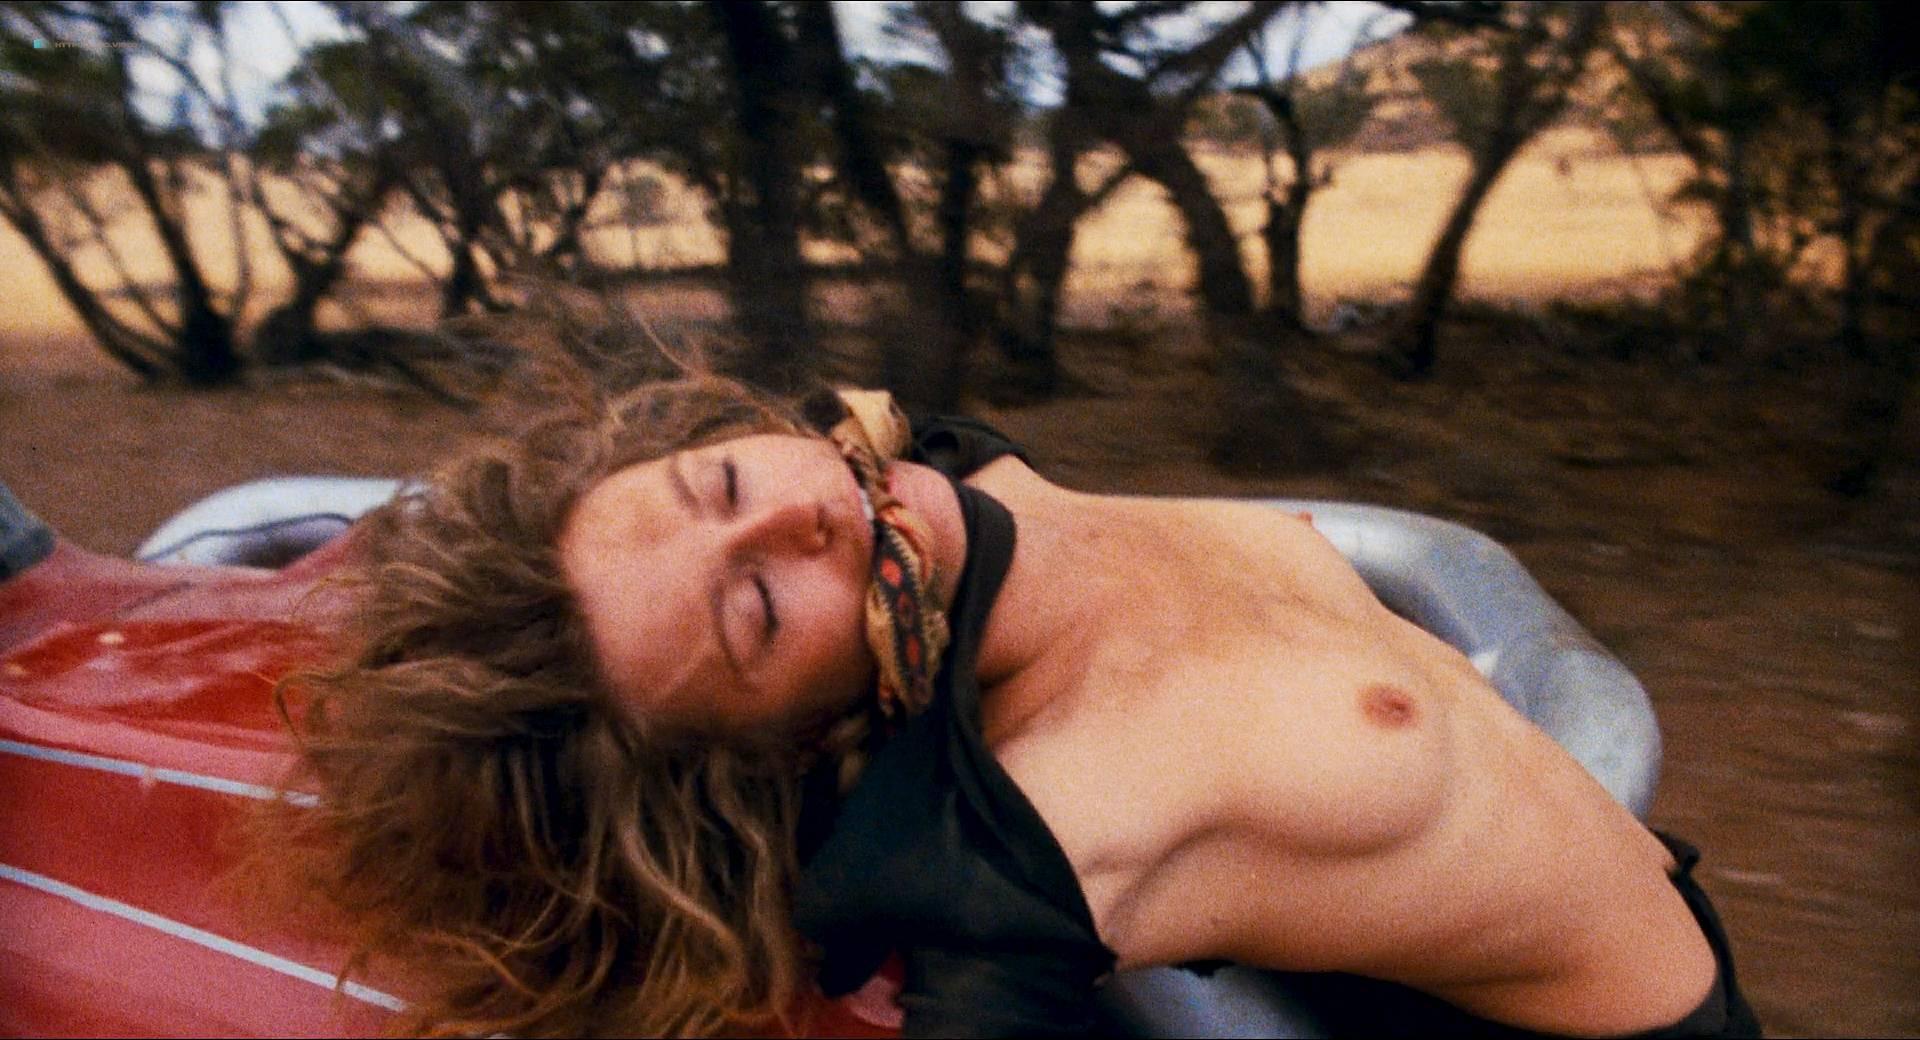 Anna oonishi video naked